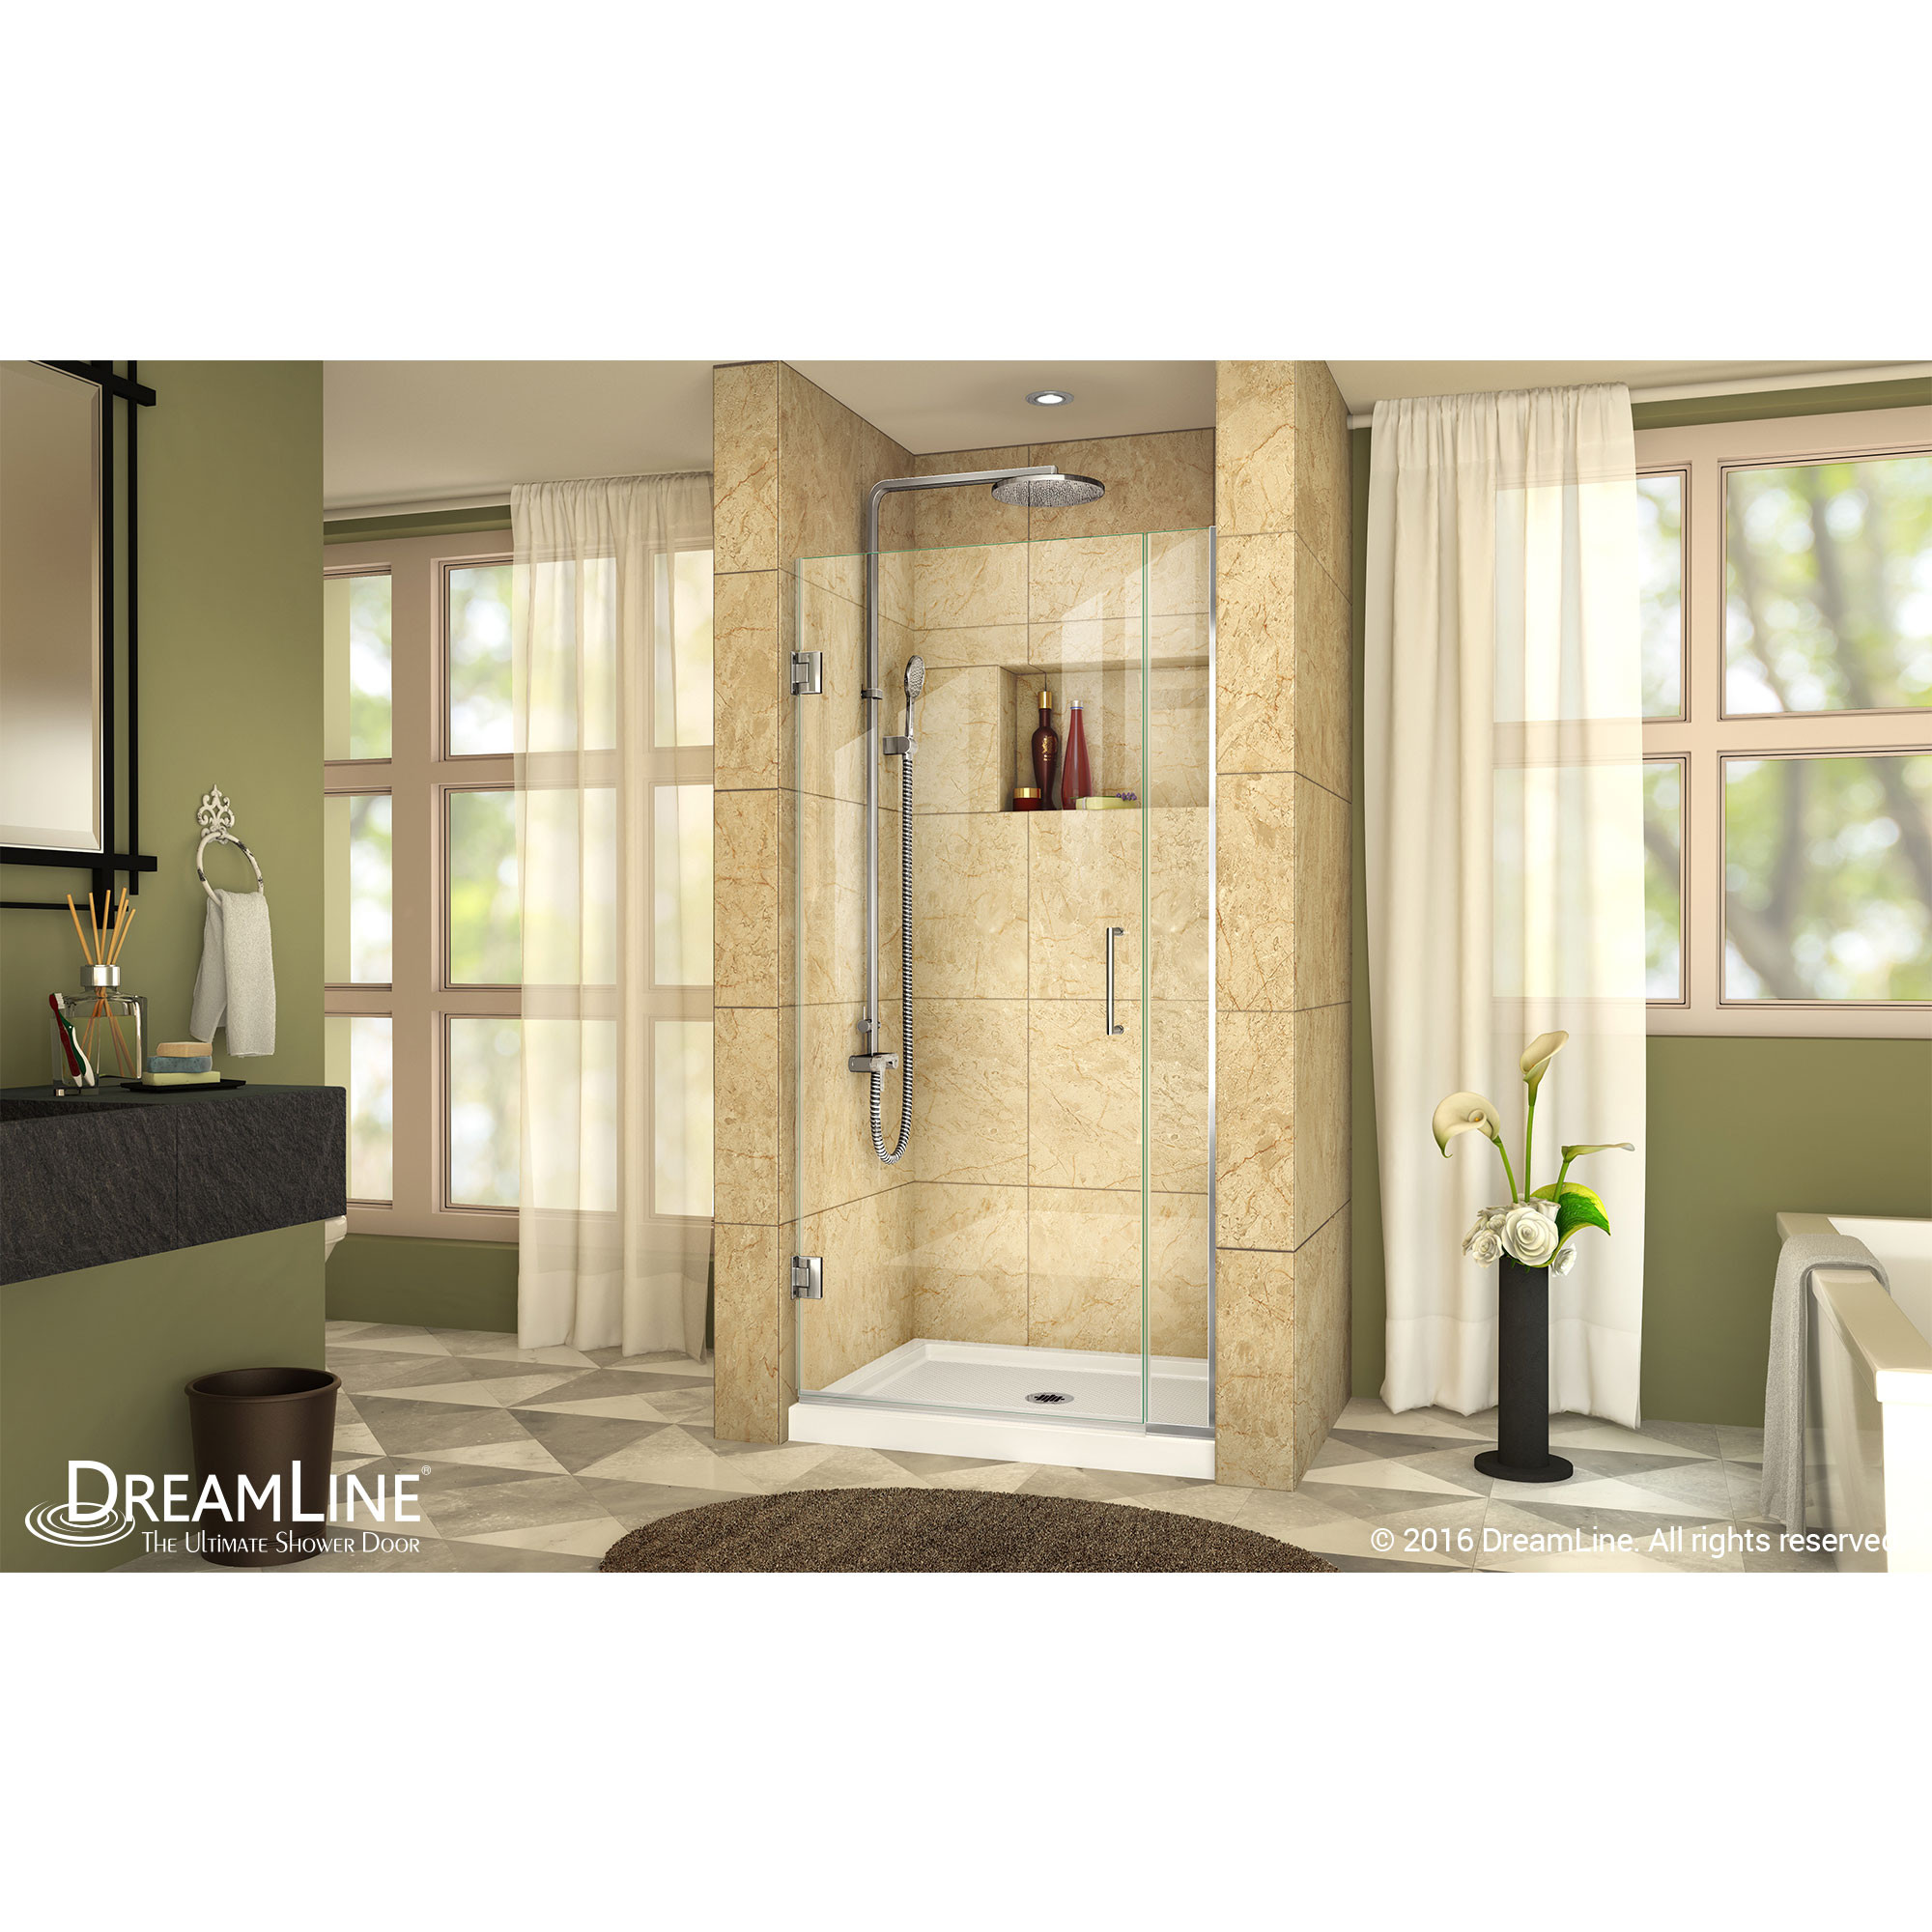 Dreamline SHDR-242907210-01 - UnidoorPlus Shower Door 39 30D 6P - Chrome Finish Hardware WB